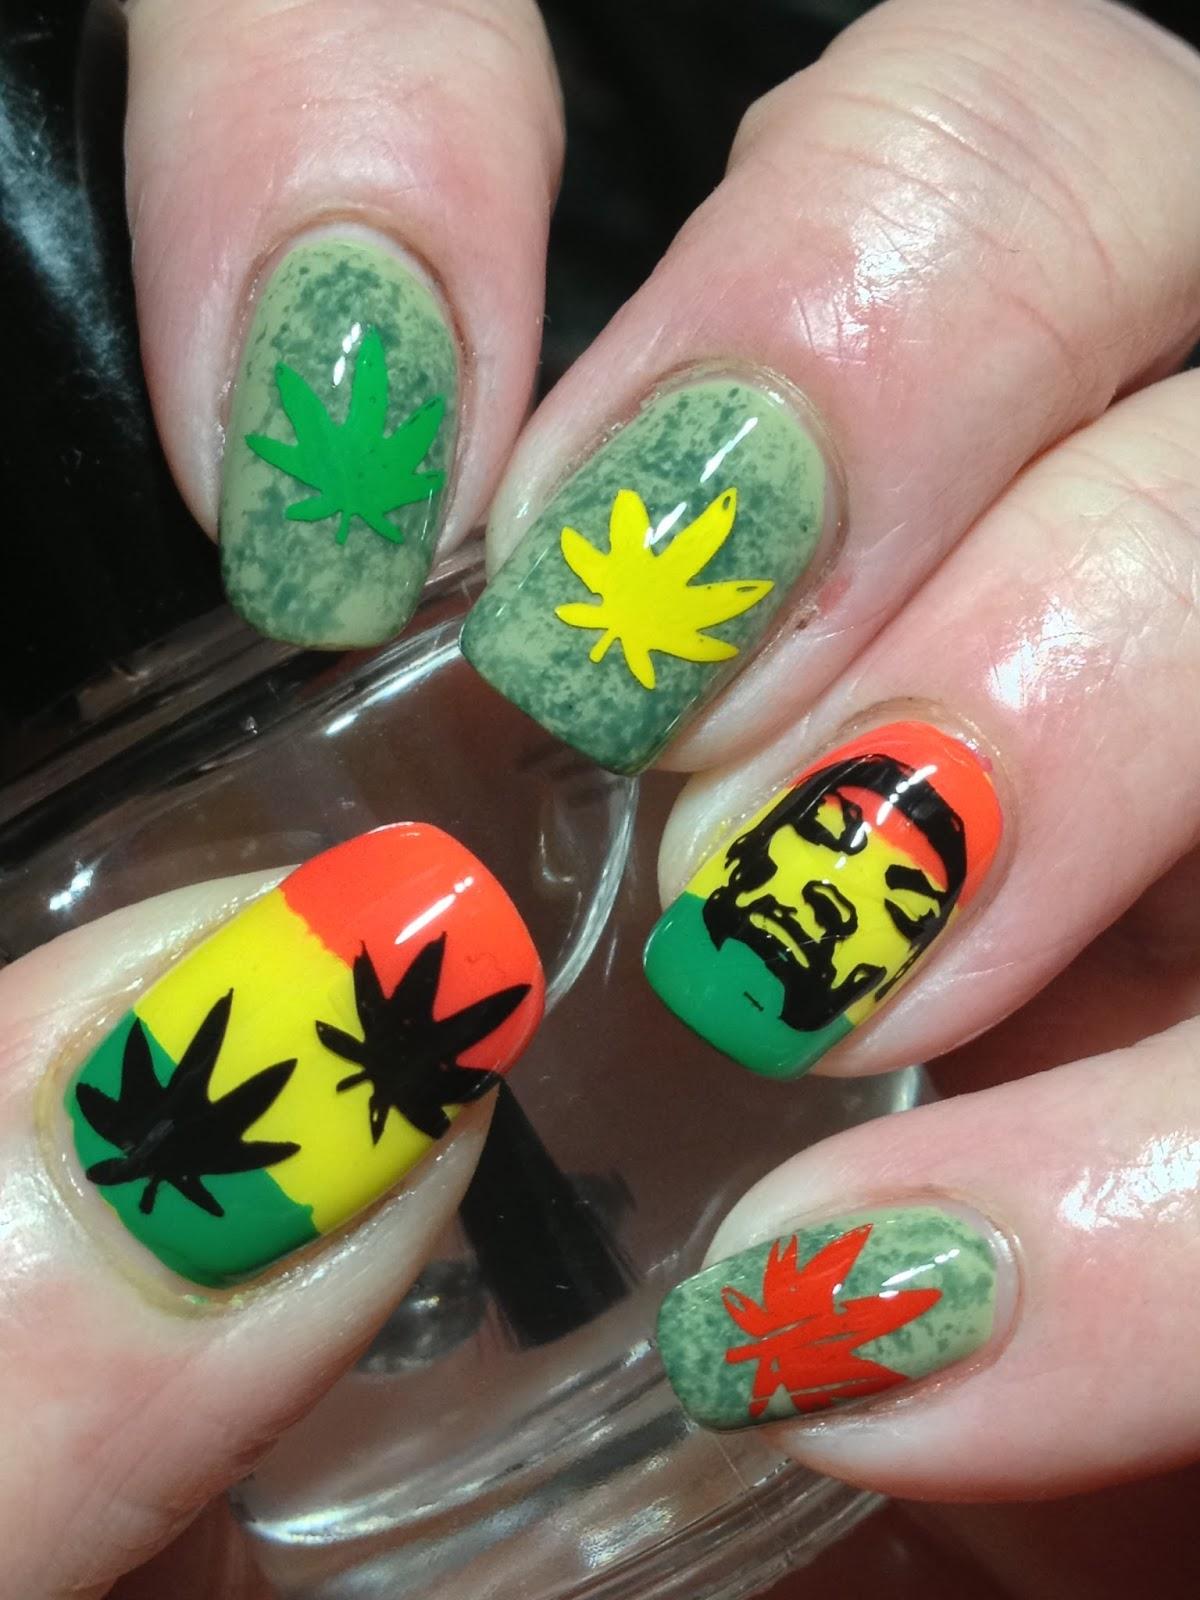 Canadian Nail Fanatic: 40 Great Nail Art Ideas Does Music